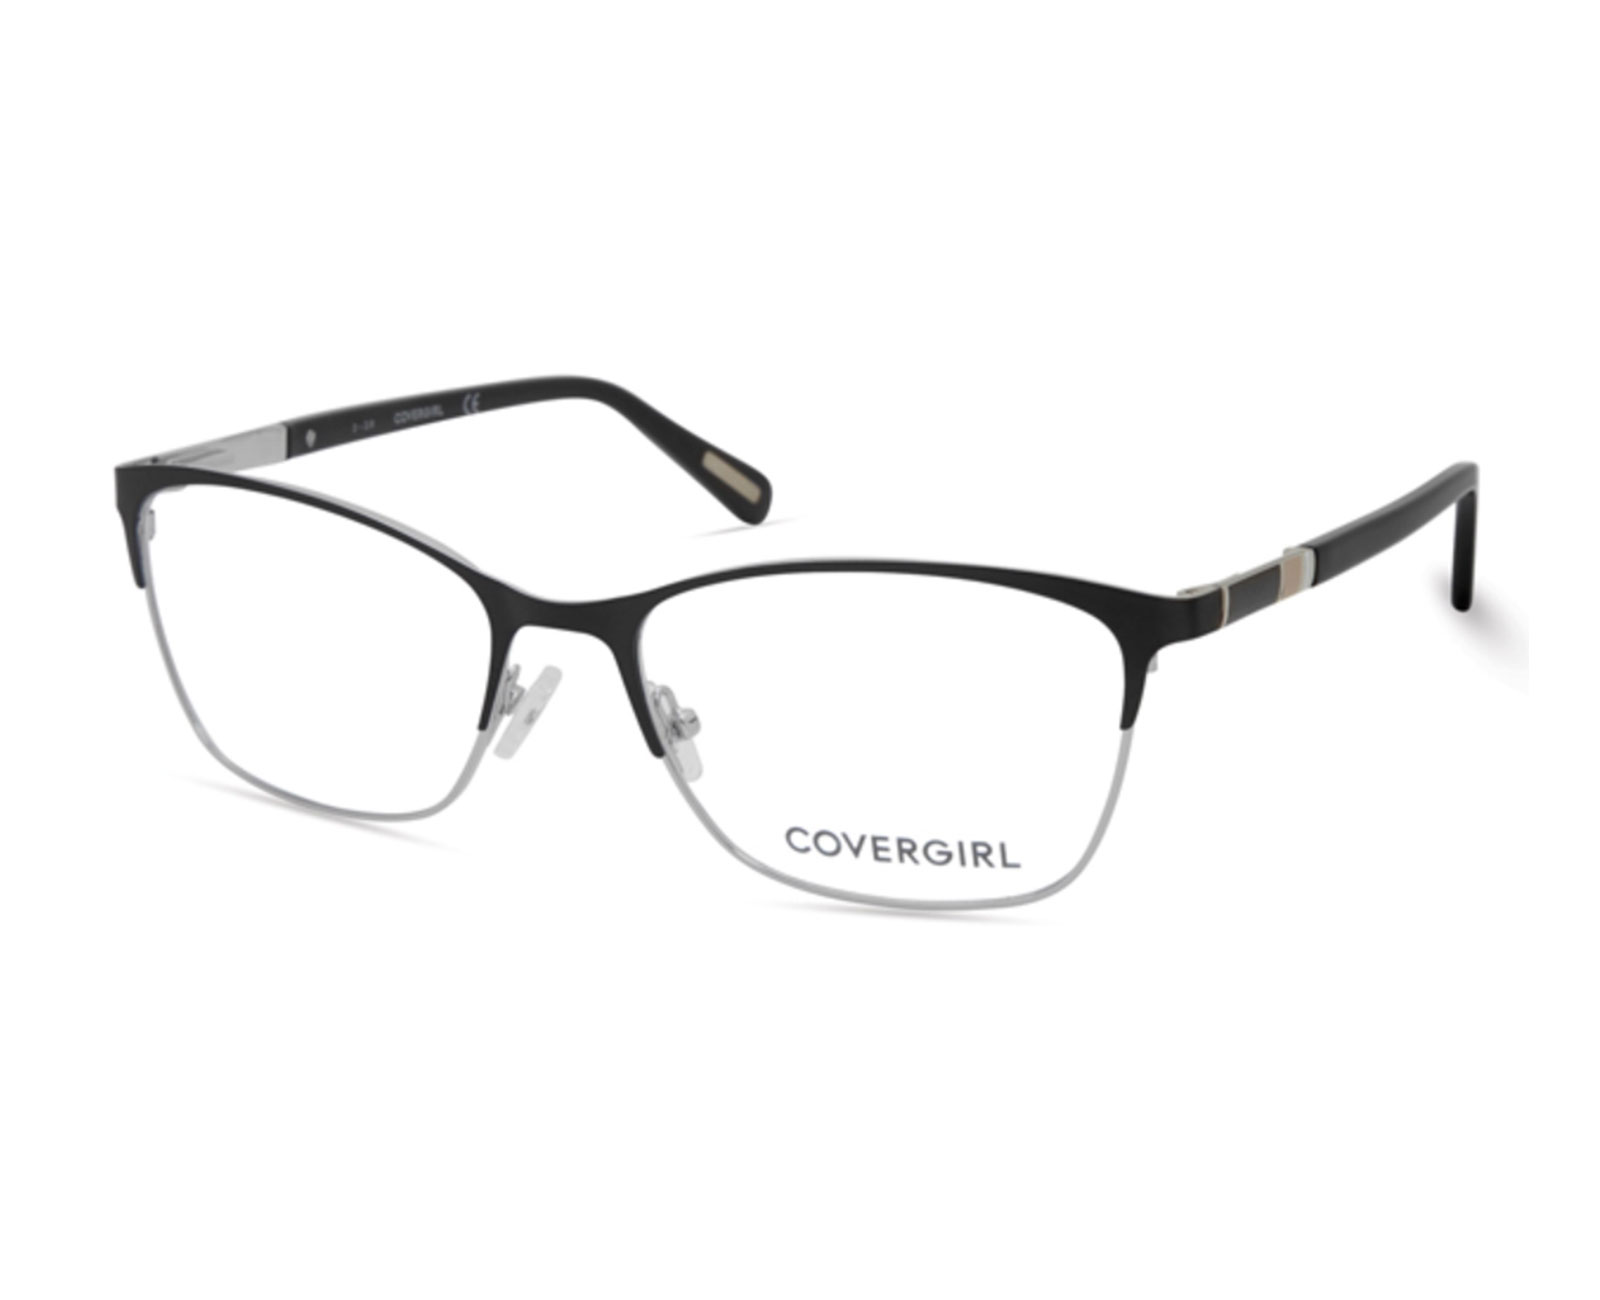 CoverGirl CG4005 in Black/Silver